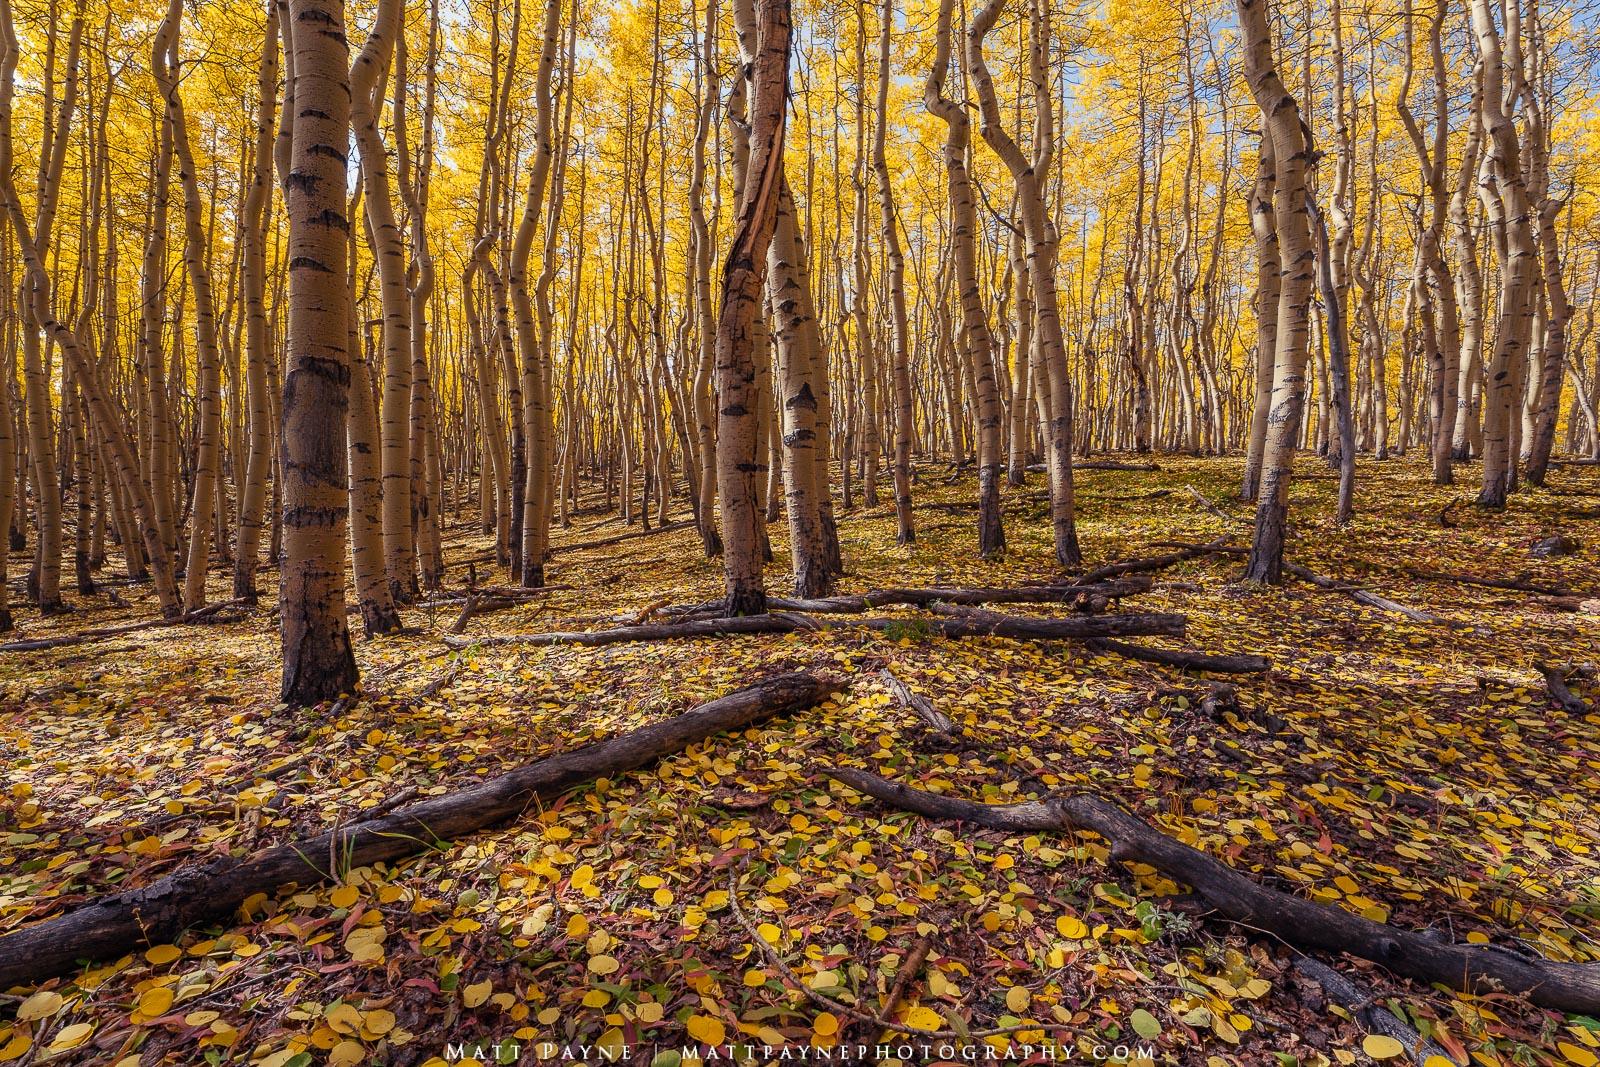 Aspen Trees, Autumn, Colorado, Fall, Fall Colors, Foliage, Landscape, Squiggly, aspen leaves, colorful, Landscape Photography, photo